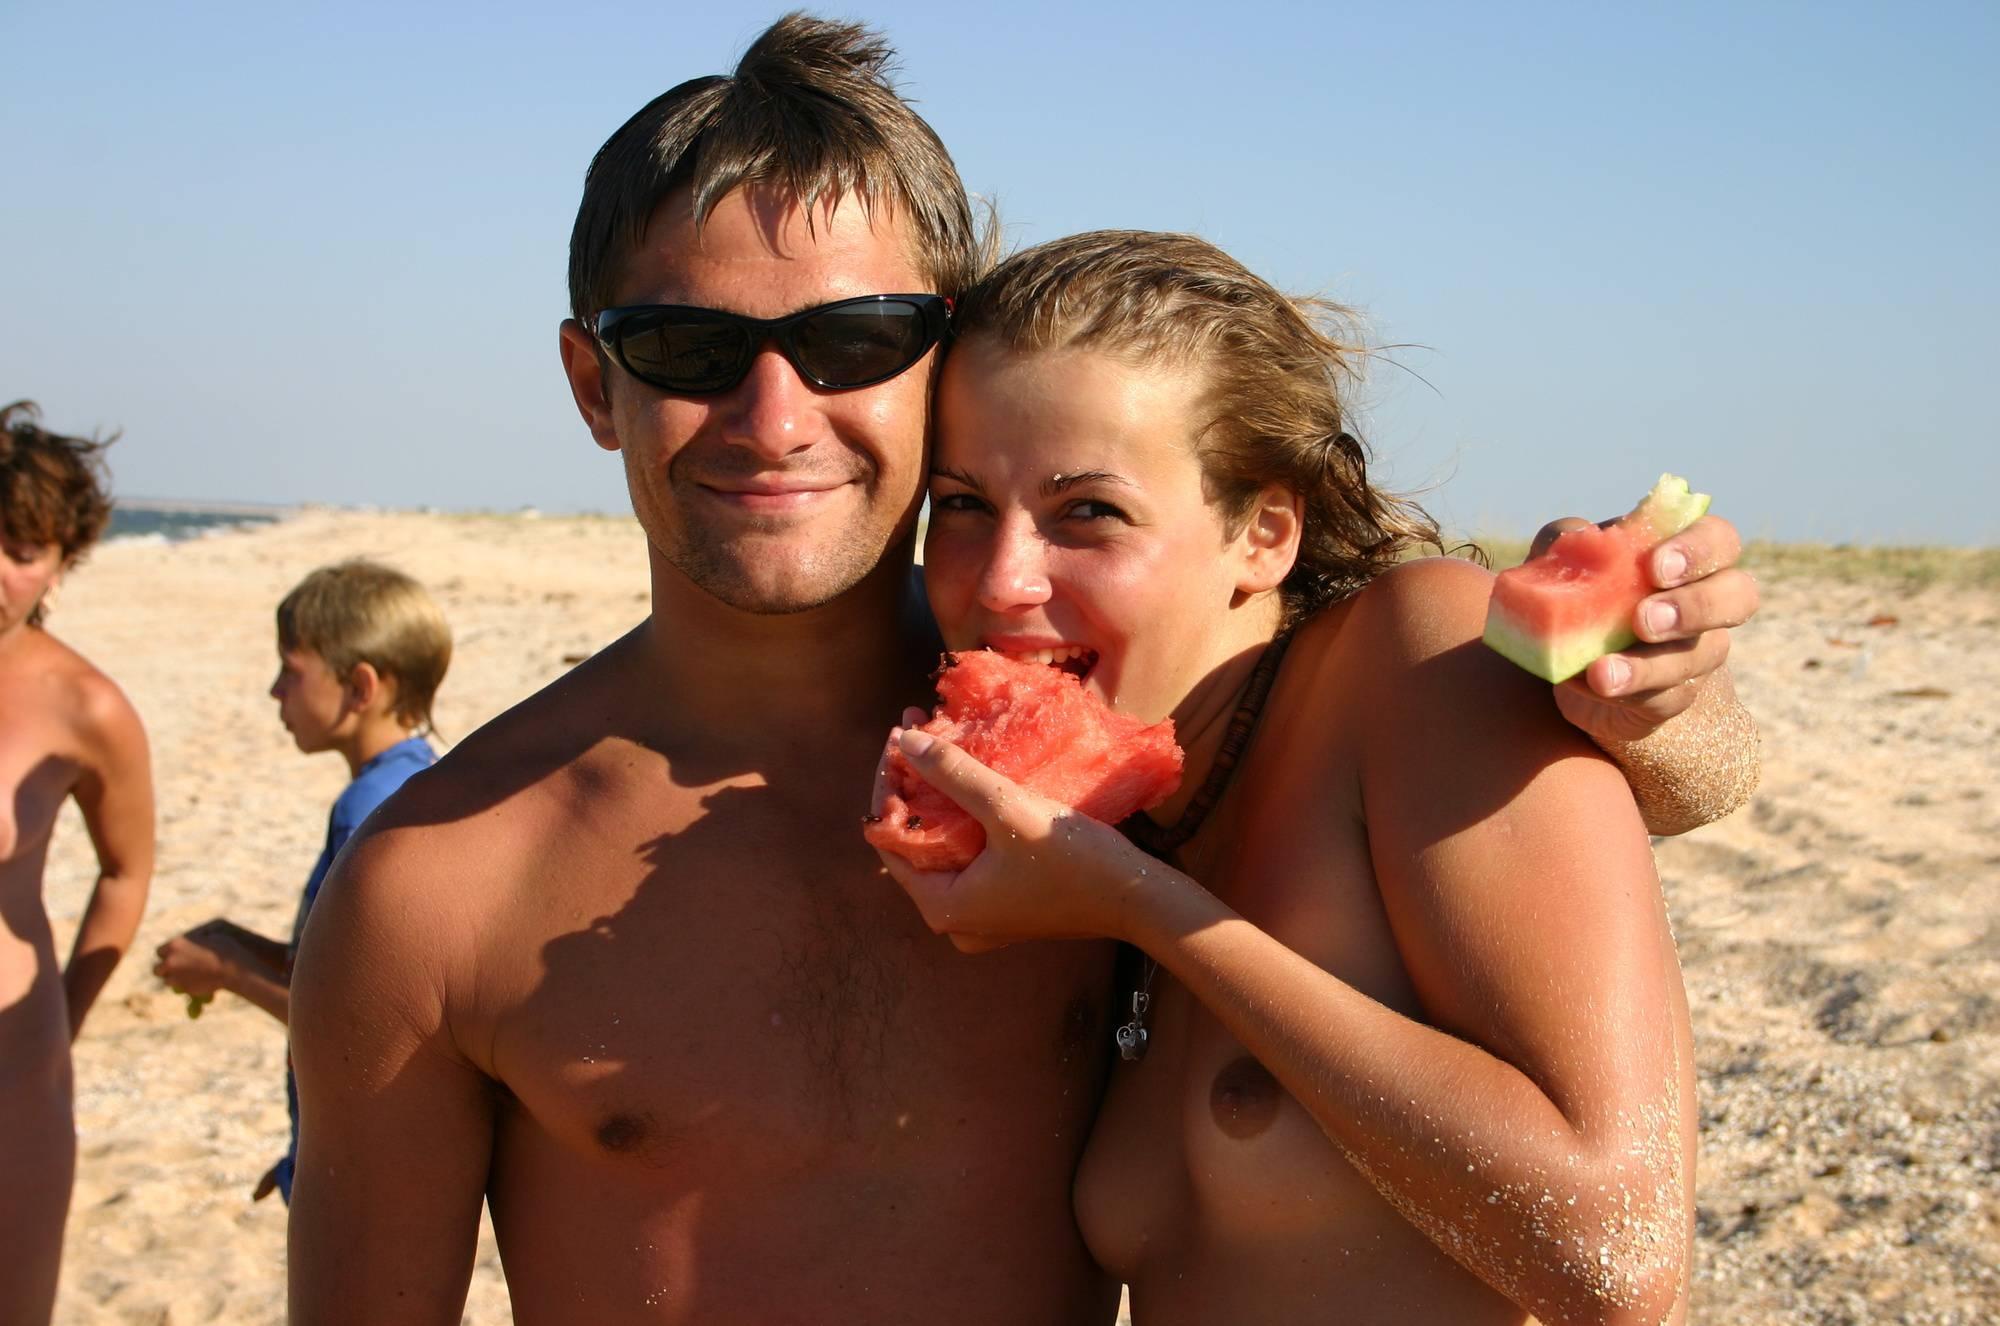 Nudist Pics Family Naturist Campsite - 1